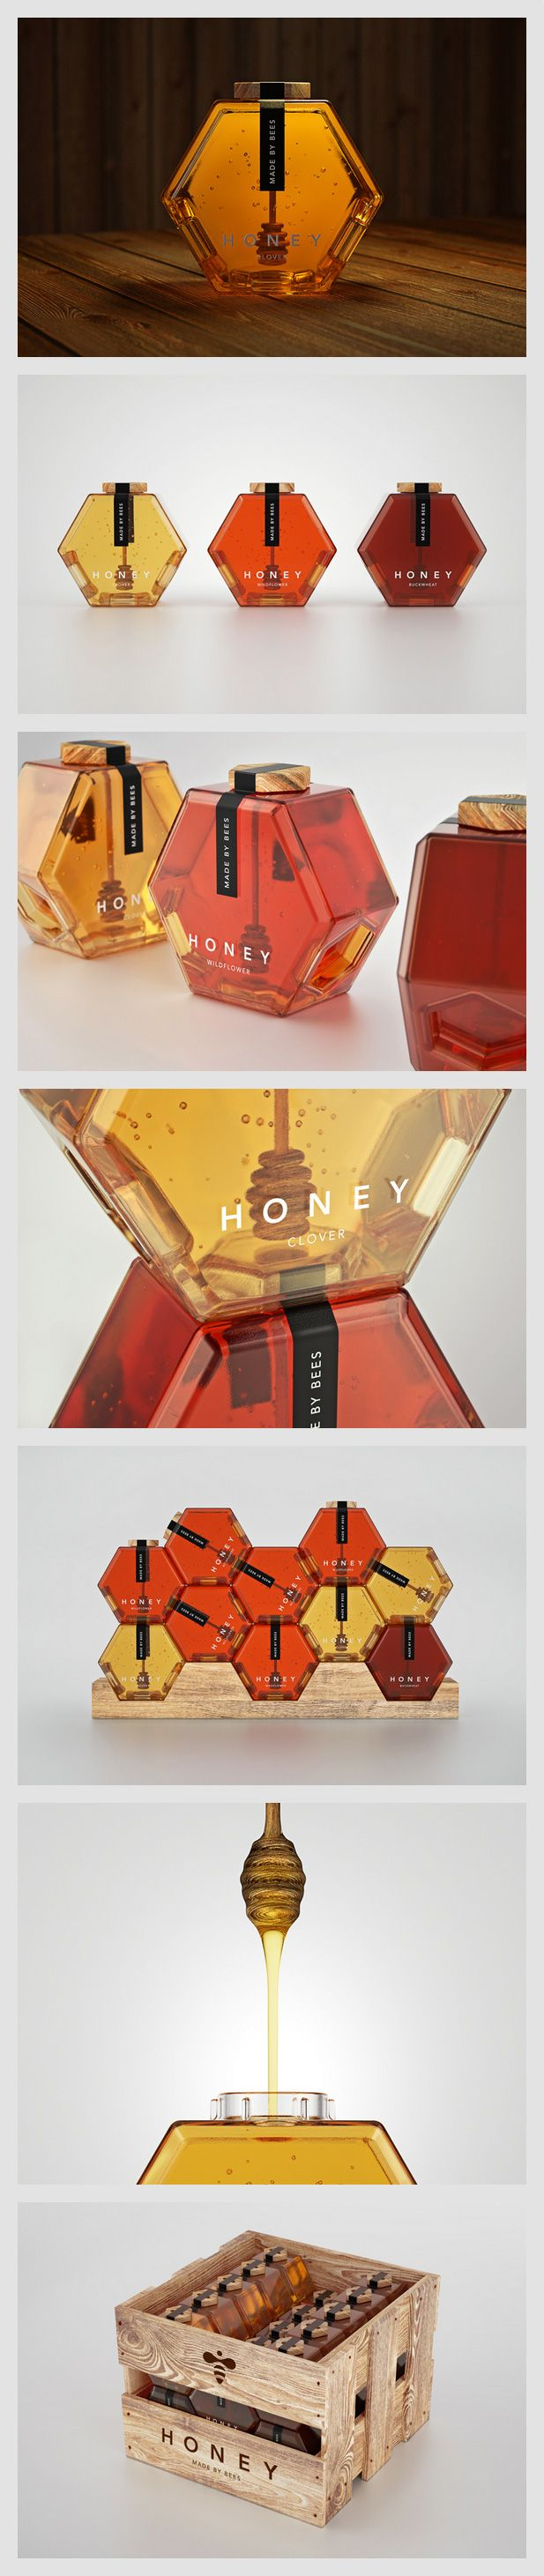 Honey Packaging Concept by Maksim Arbuzov. #Honey #Packaging #Advertising #Design